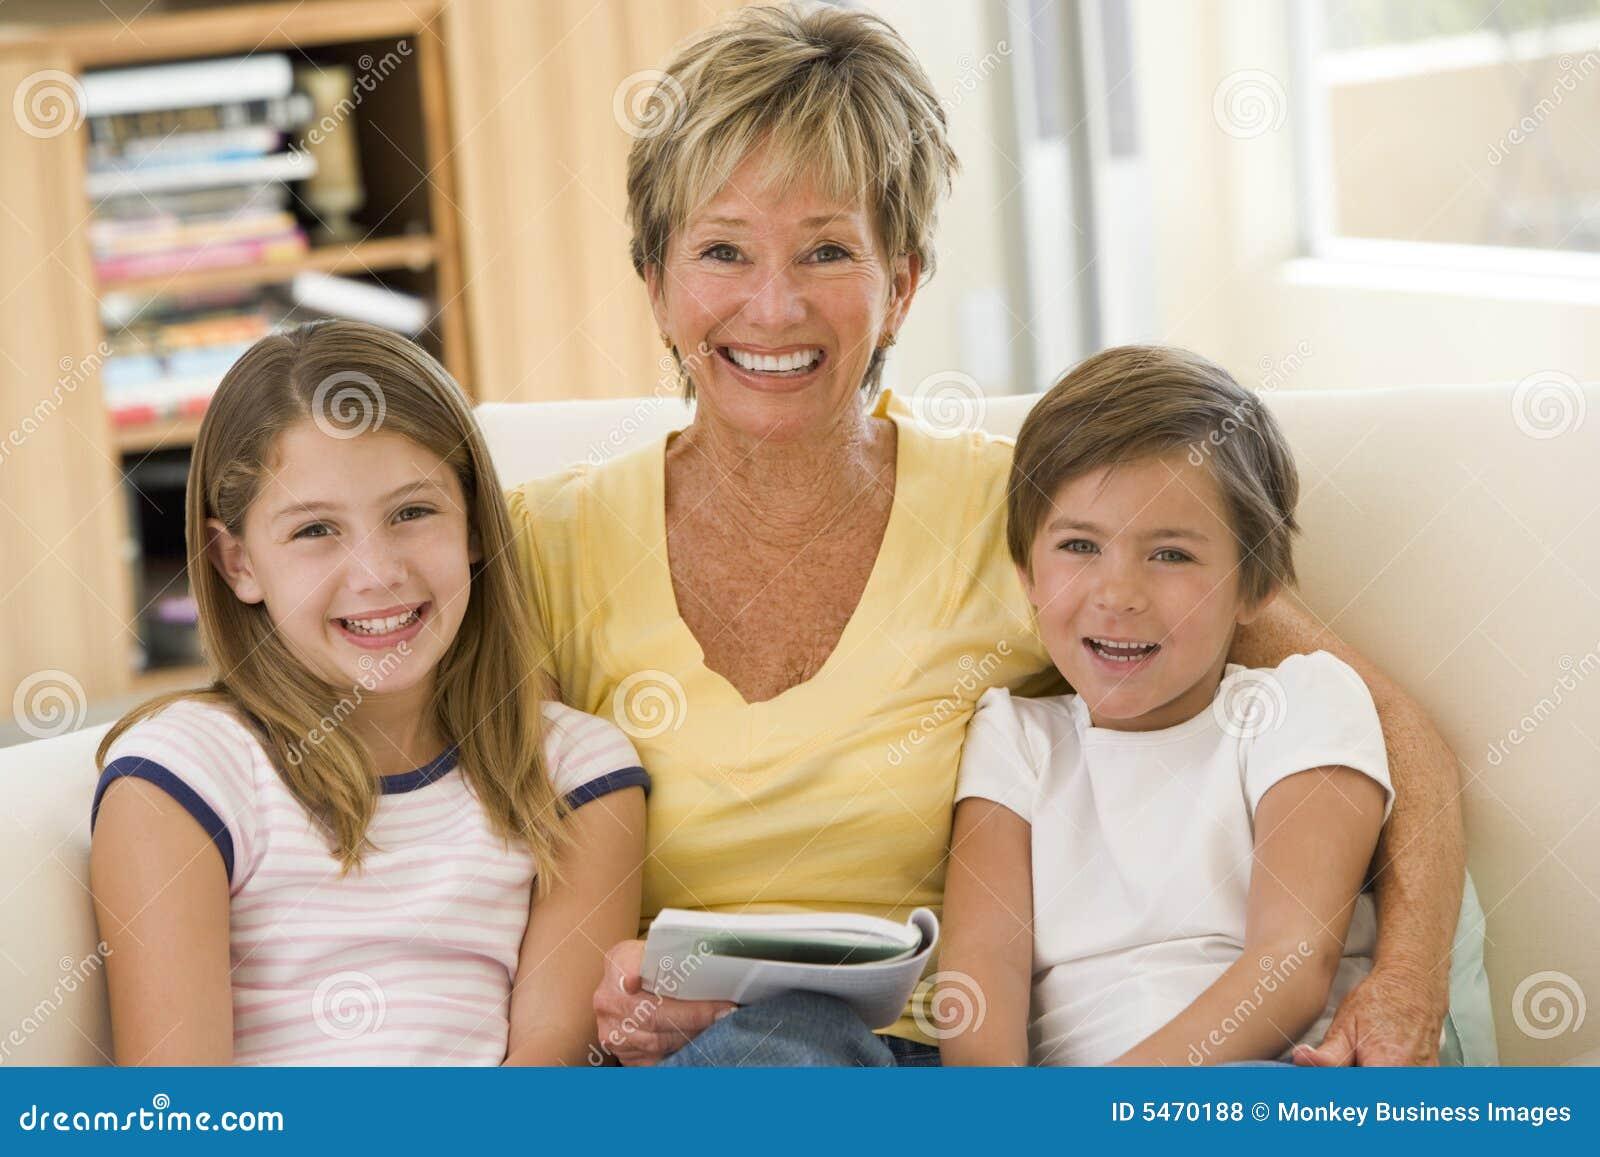 Grandmother reading with grandchildren